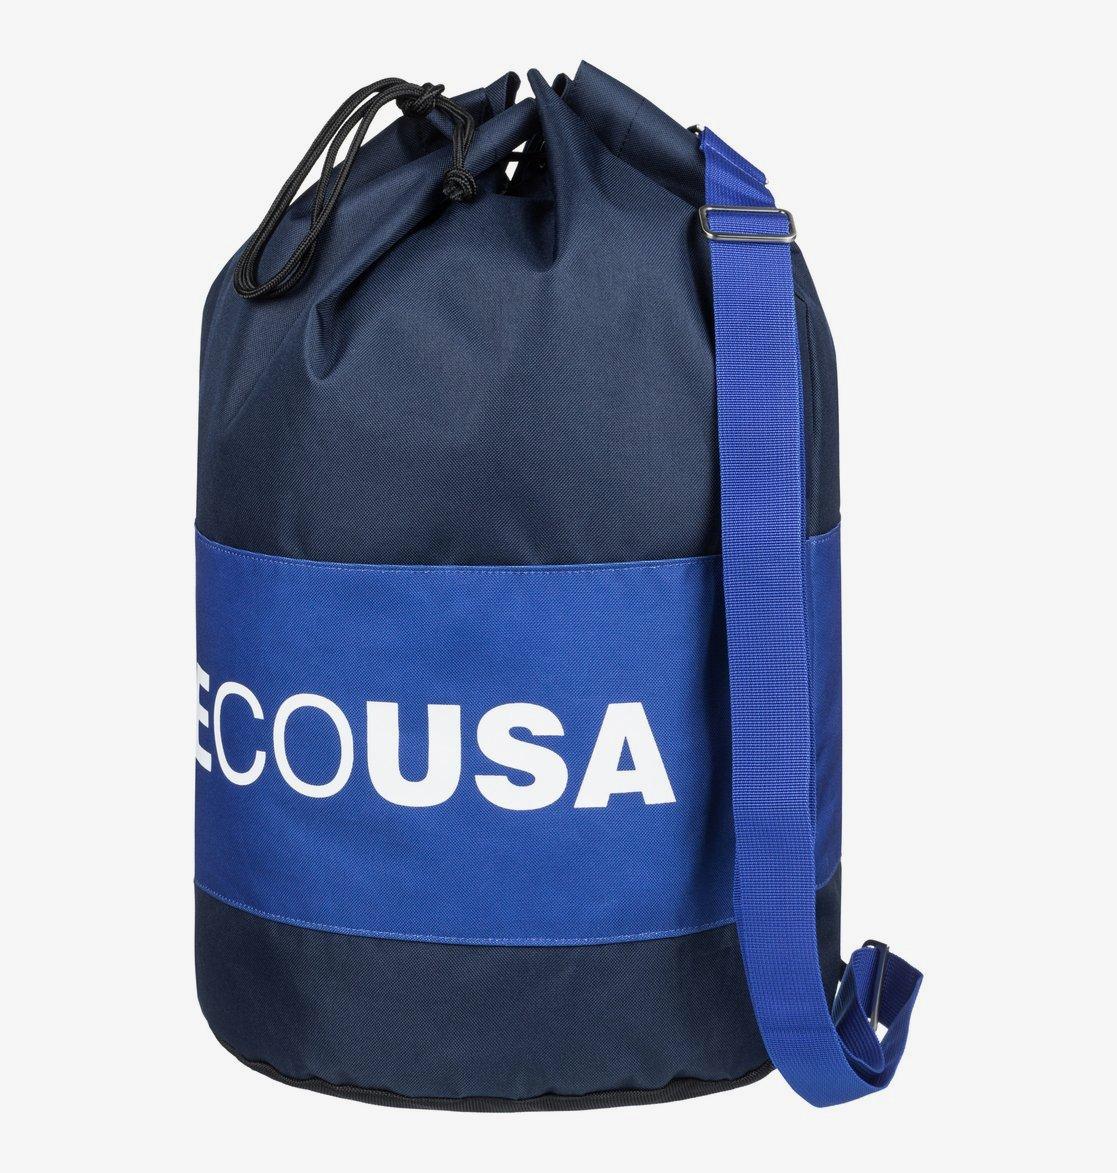 Plop Sack 75l Oversized Drawstring Duffle Bag